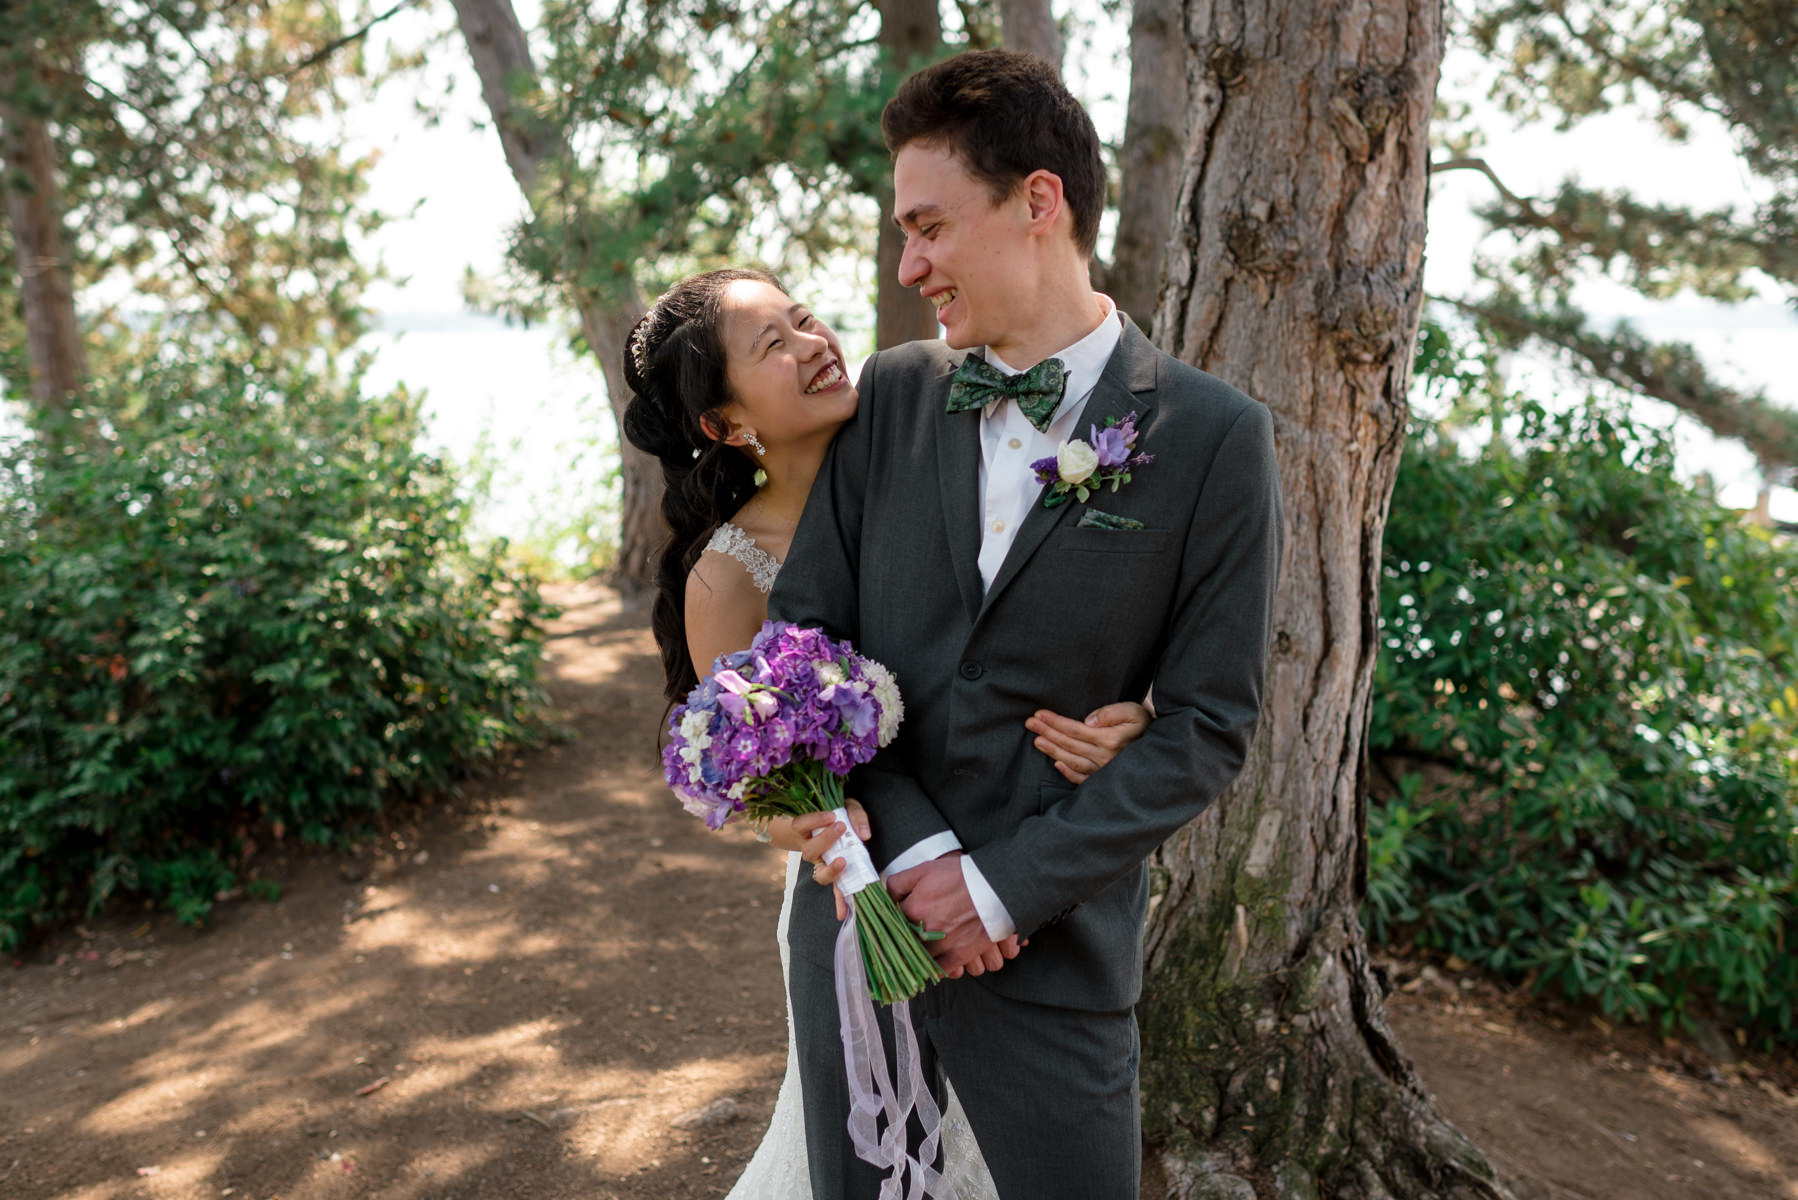 Andrew Tat - Documentary Wedding Photography - Heritage Hall - Kirkland, Washington - Grace & James - 29.JPG